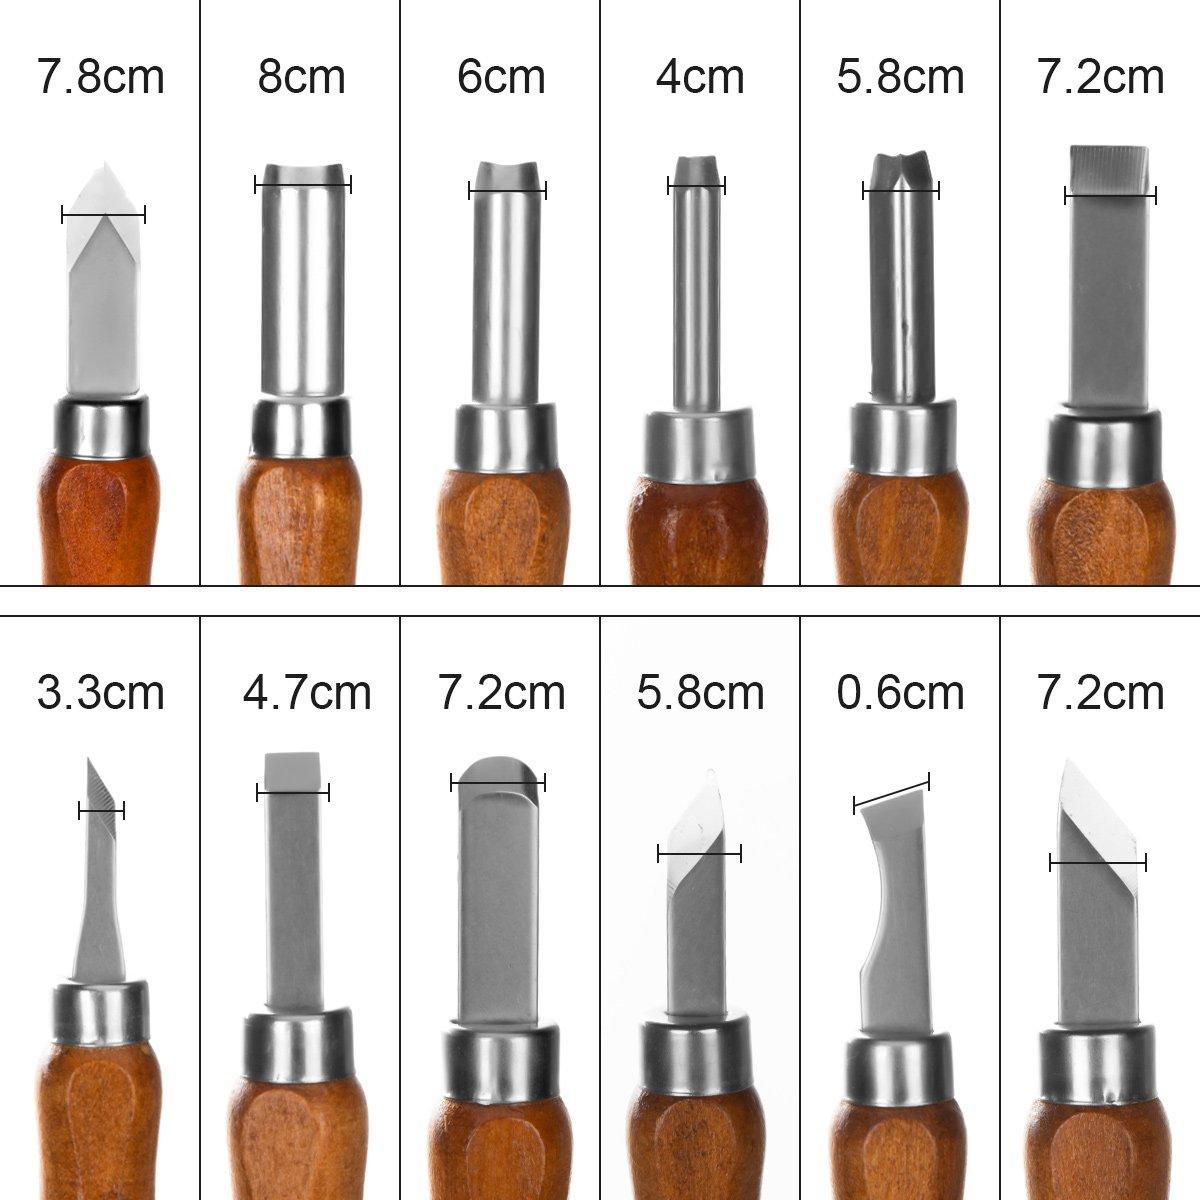 iSwank Cinceles para Madera, Juego de Cinceles 12 tipos 14 cm Gubias Cuchillos Herramientas para Tallar Madera Cera Aceituna Nuez Arcilla para ...